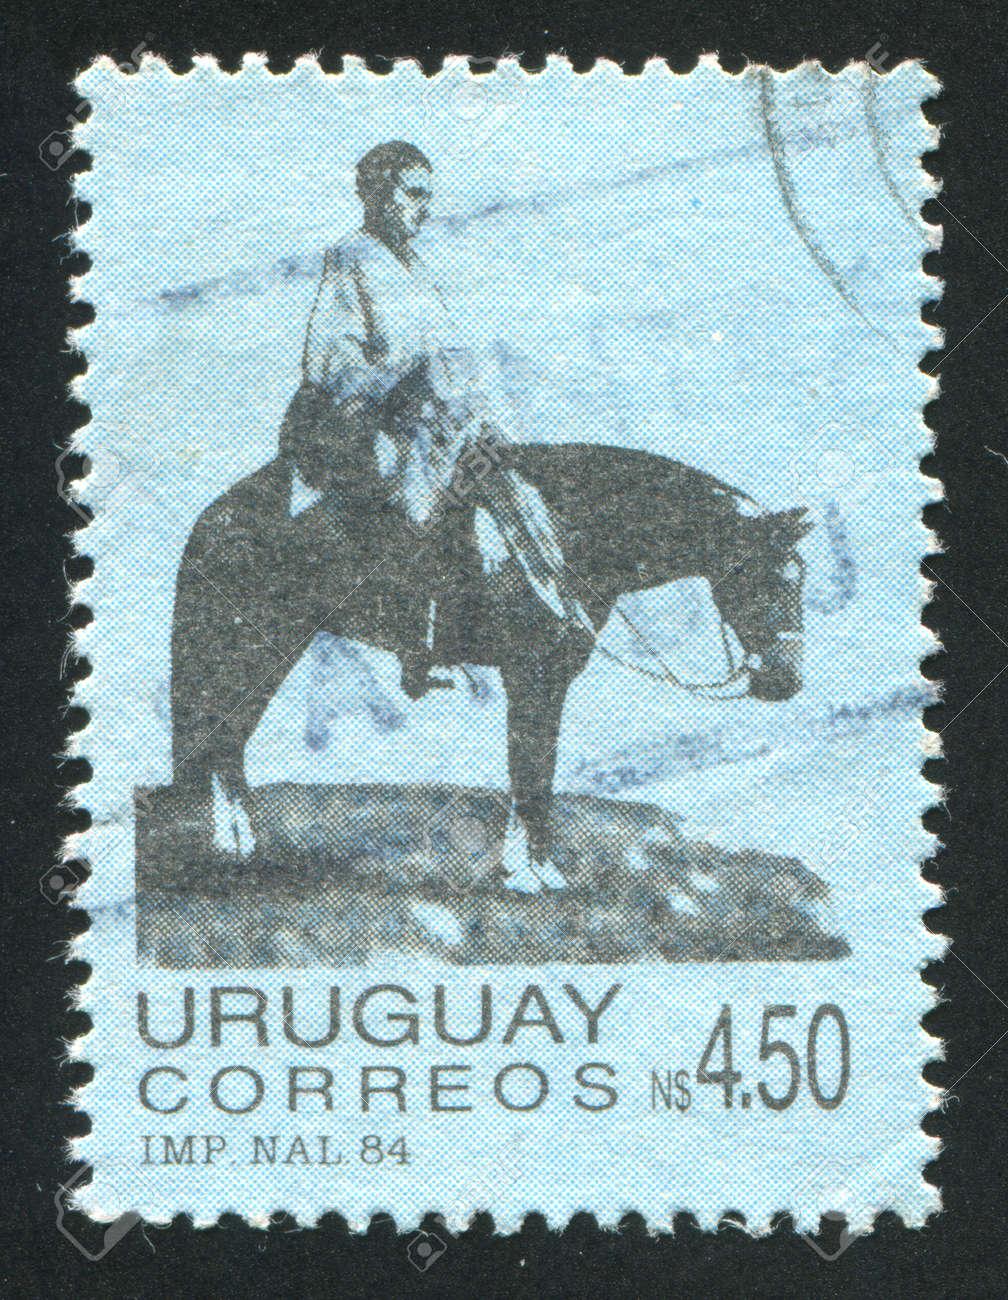 URUGUAY - CIRCA 1984: stamp printed by Uruguay, shows Artigas on the Plains, circa 1984 Stock Photo - 13892121